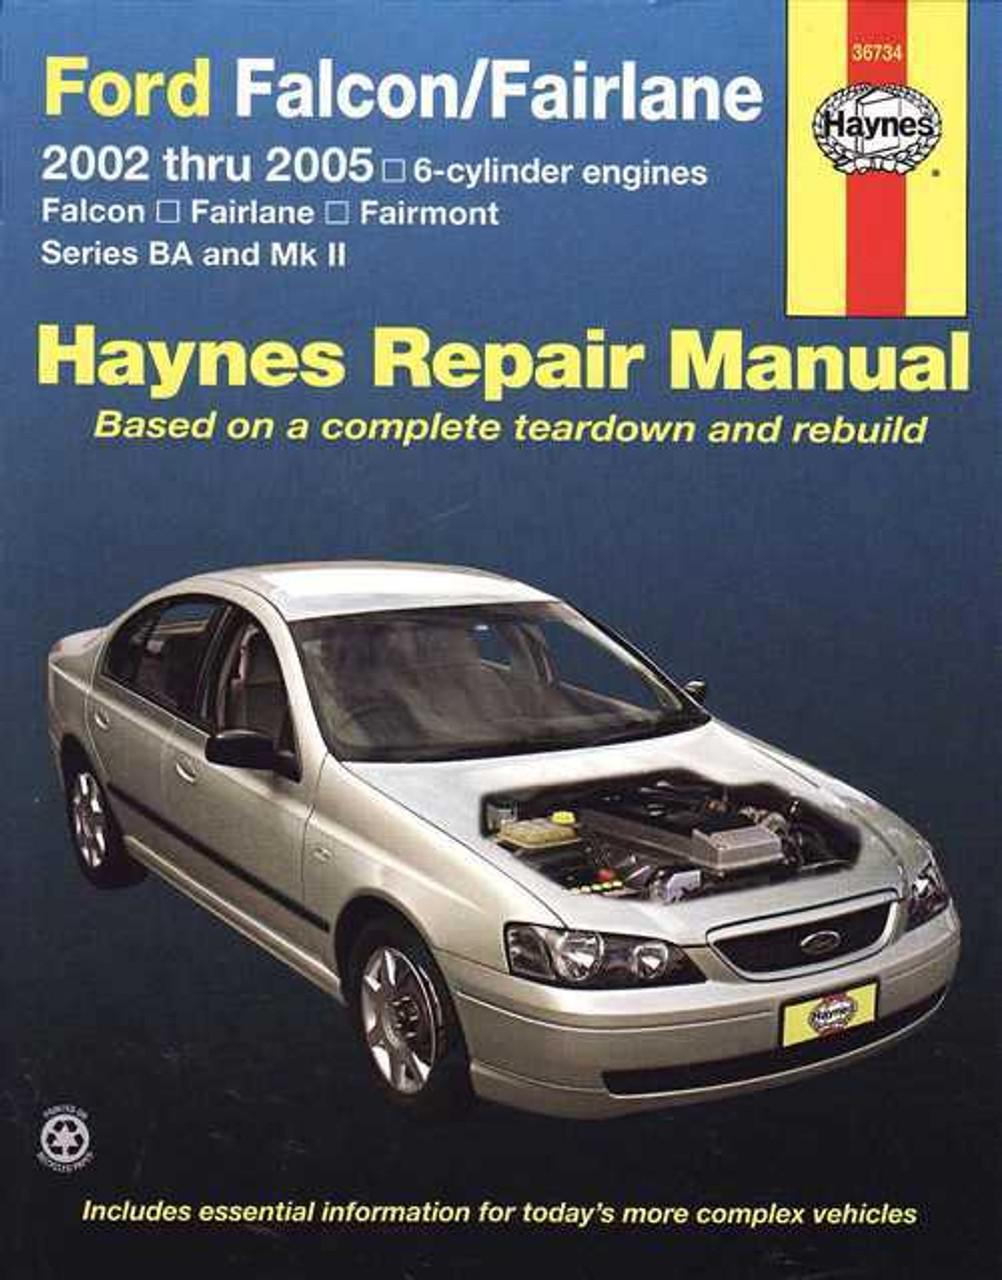 ford falcon ba 2004 service manual open source user manual u2022 rh dramatic varieties com Ford Manual Shift Ford Truck Manuals